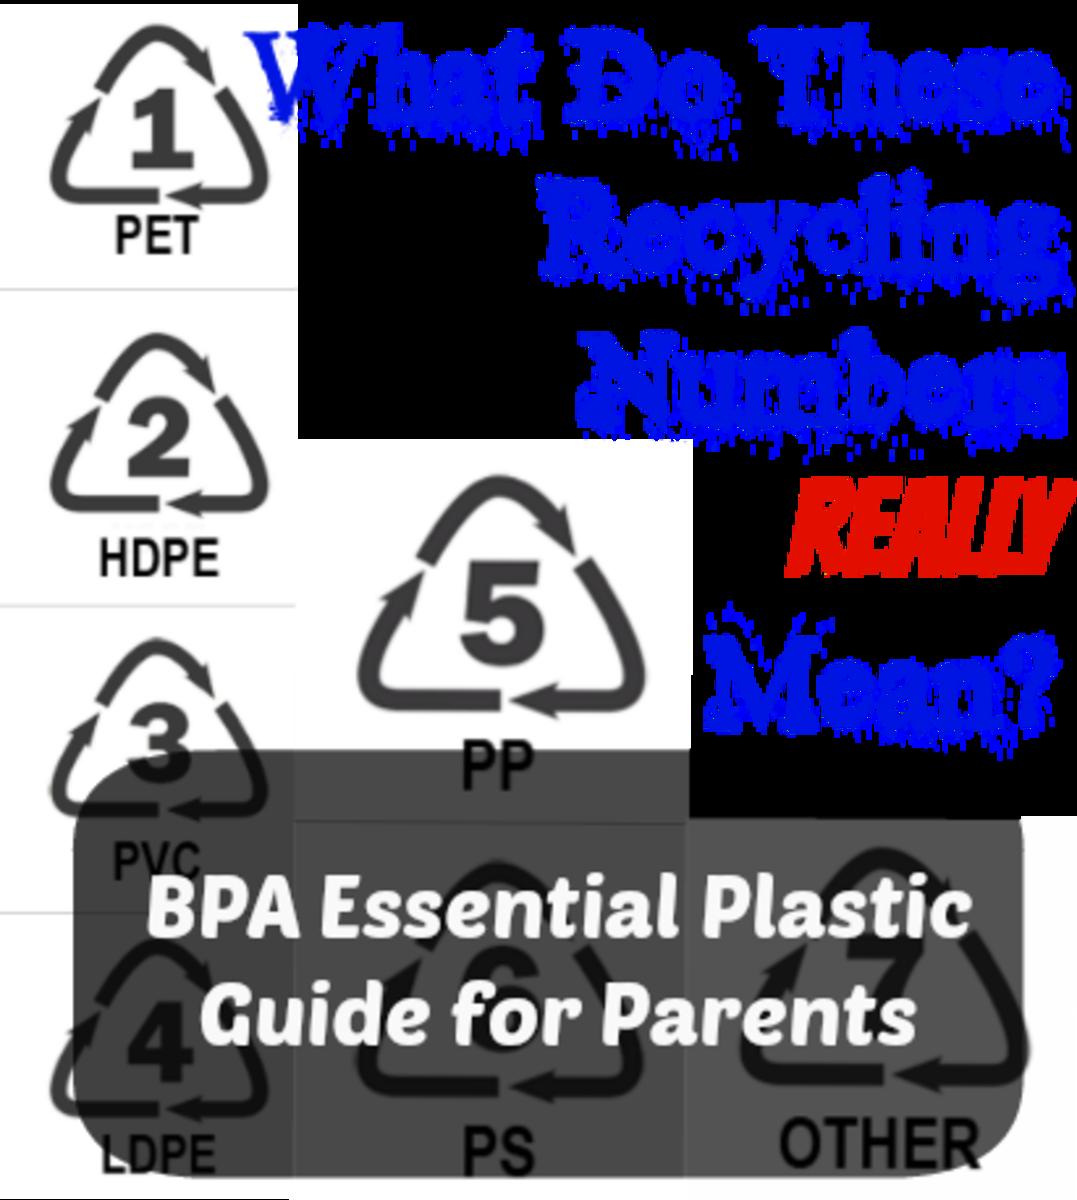 BPA Free? What Does BPA Free Mean?